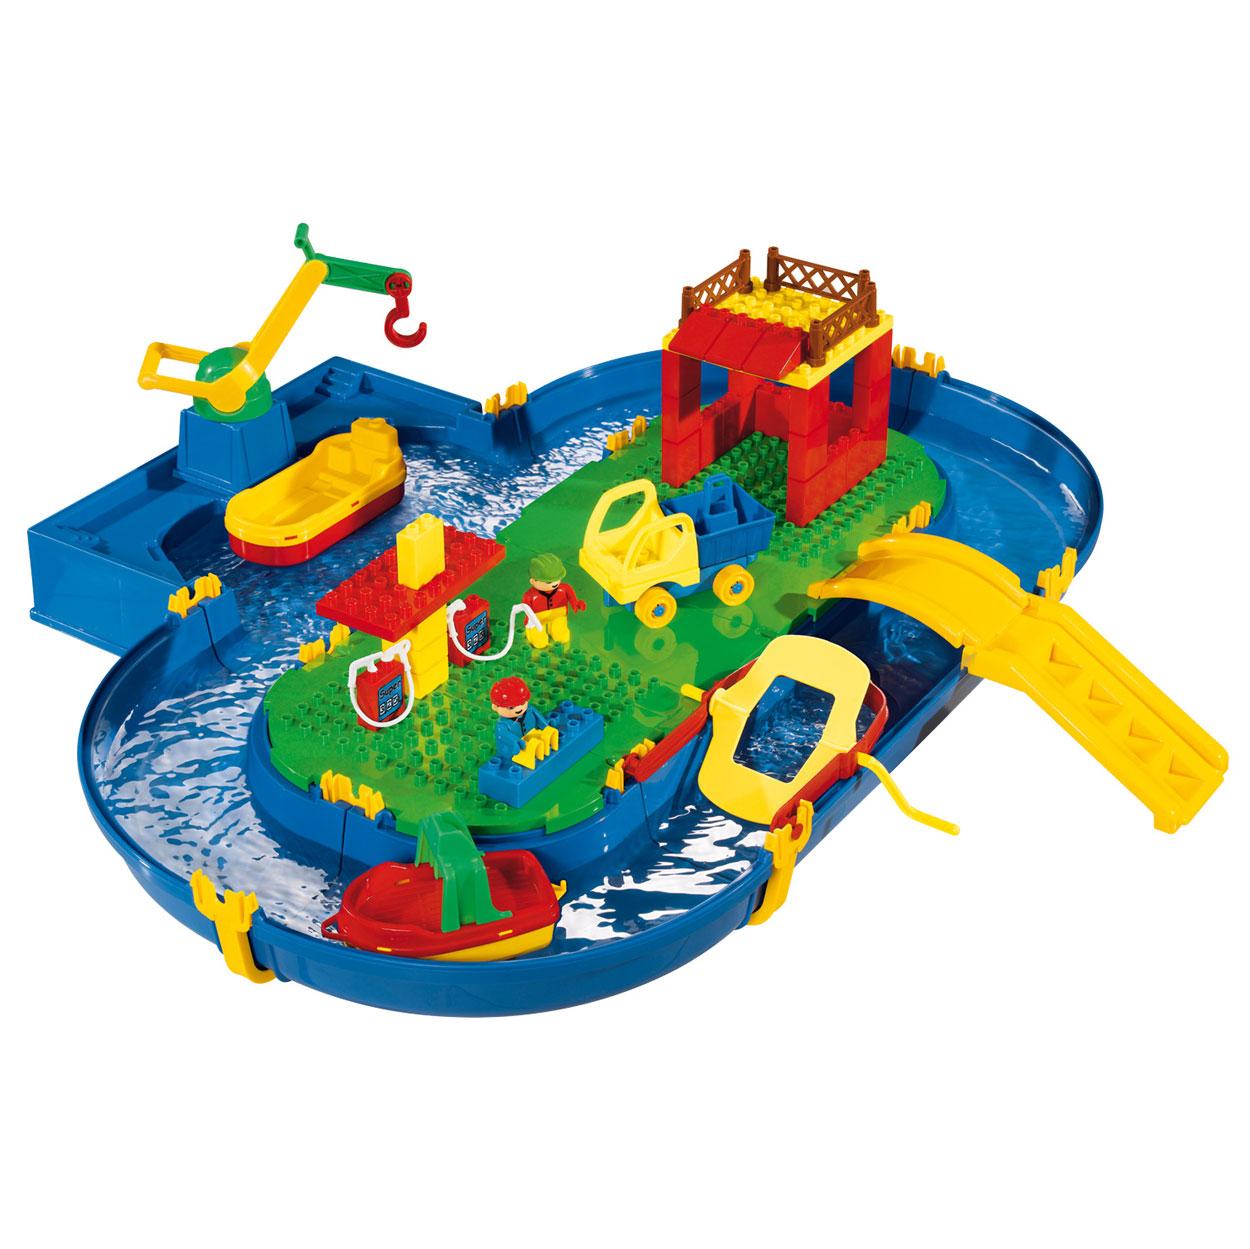 Big Waterplay Triëst Online Kopen Lobbesnl